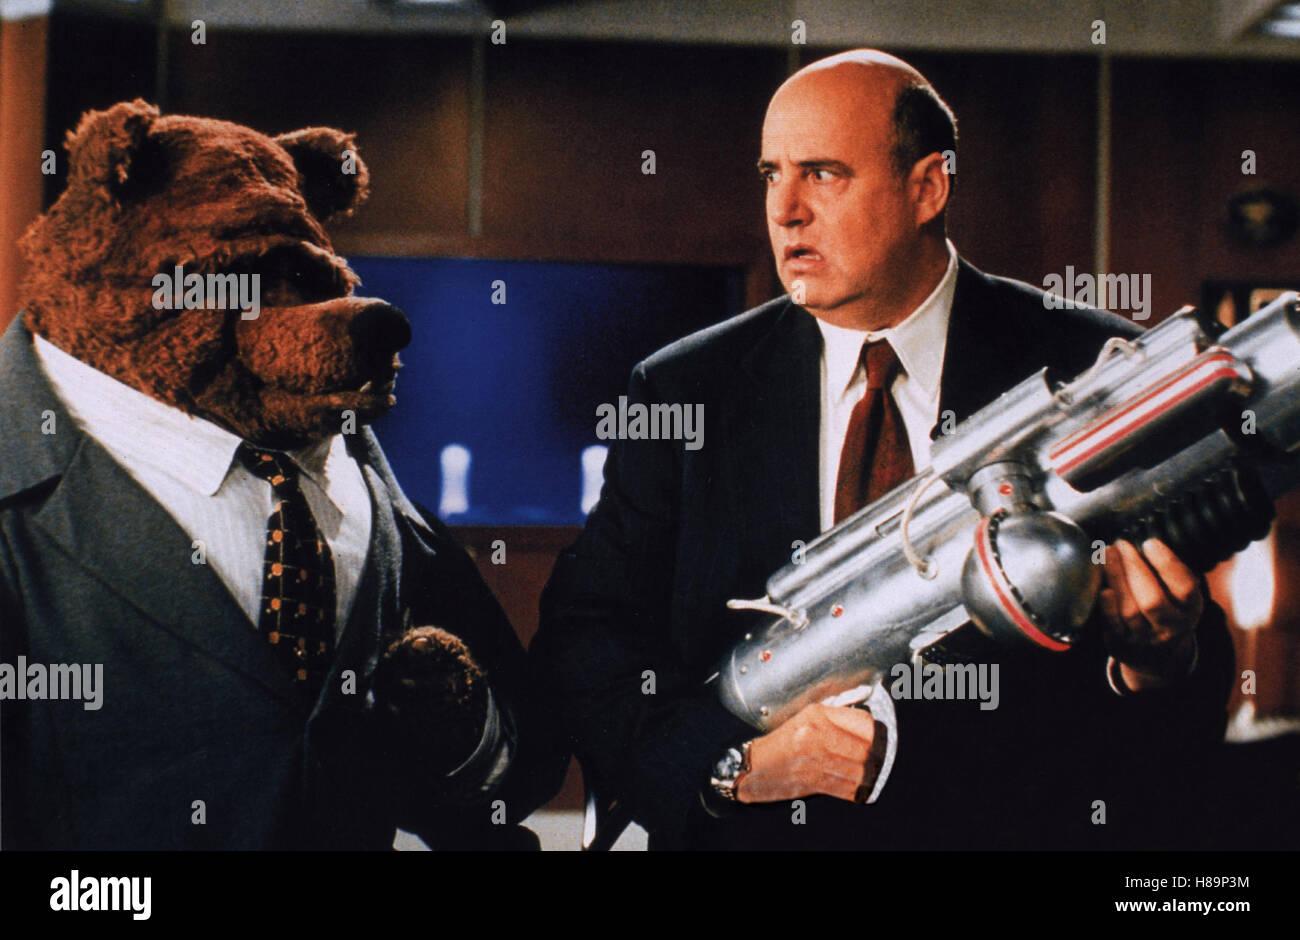 Muppets aus dem All, (MUPPETS FROM SPACE) USA 1999, Regie: Tim Hill, JEFFREY TAMBOR, Stichwort: Waffe - Stock Image